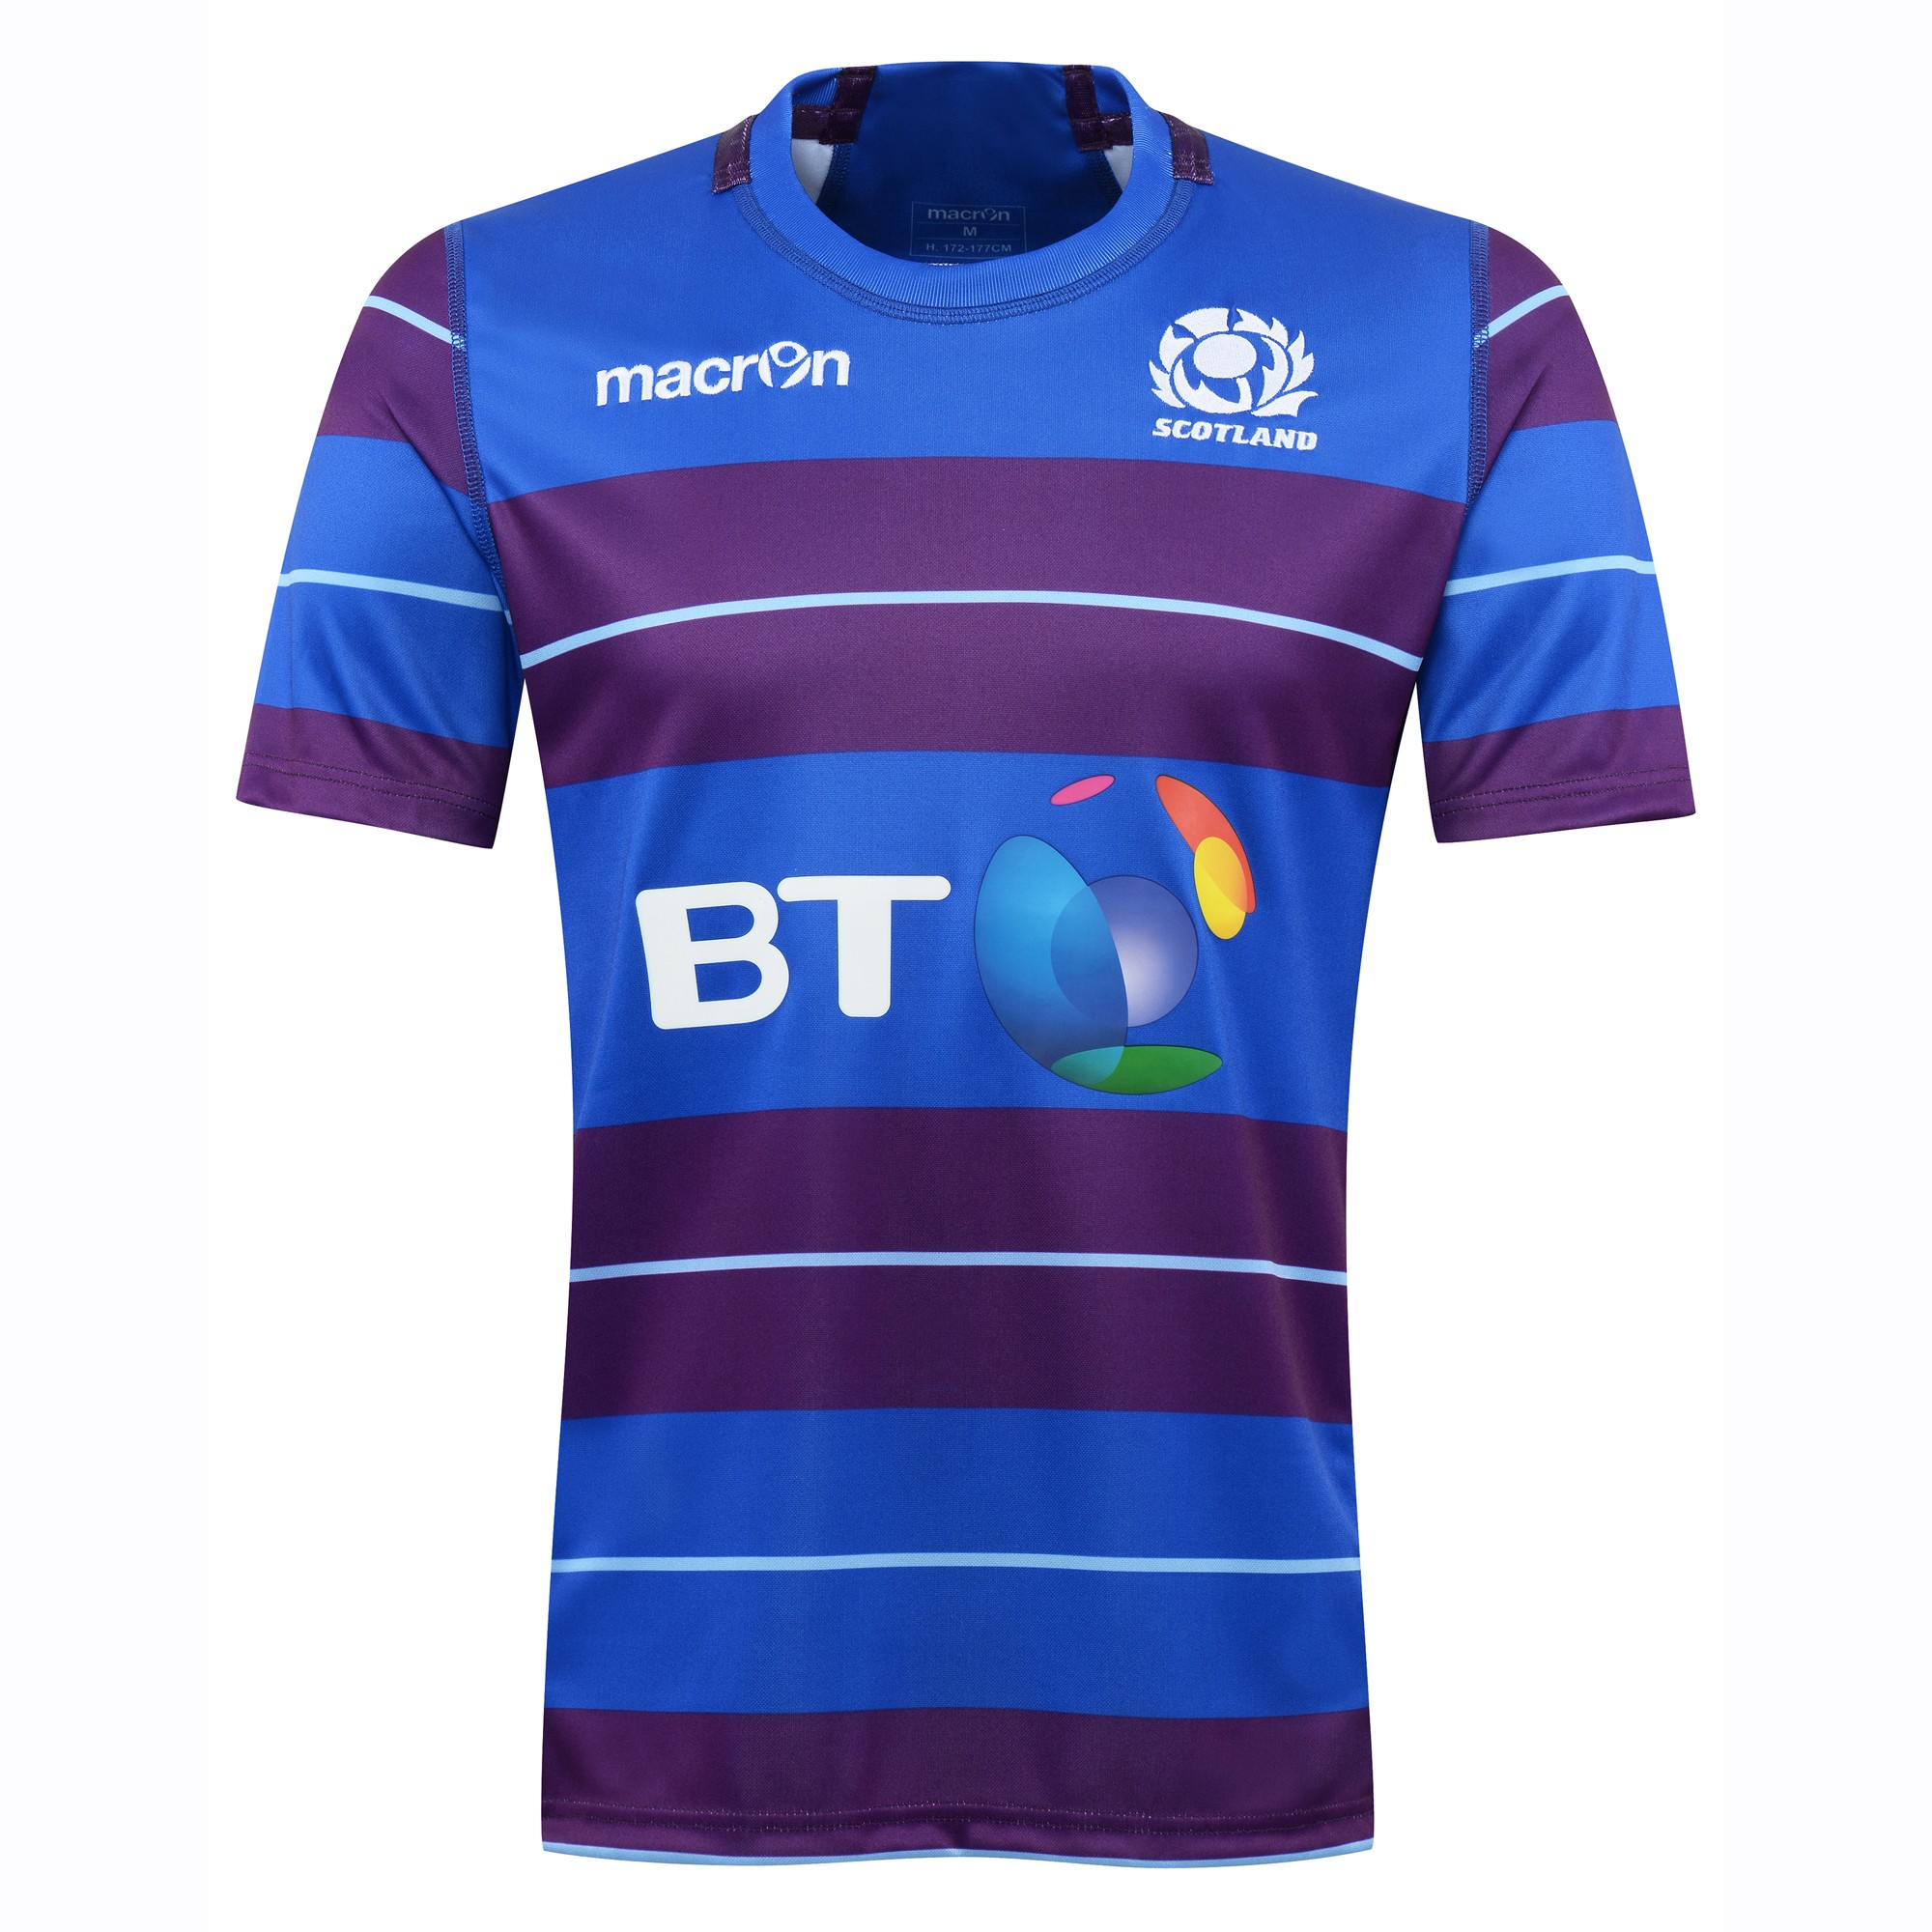 2016-2017 Scotland Macron Rugby Training Jersey (Blue) - Kids